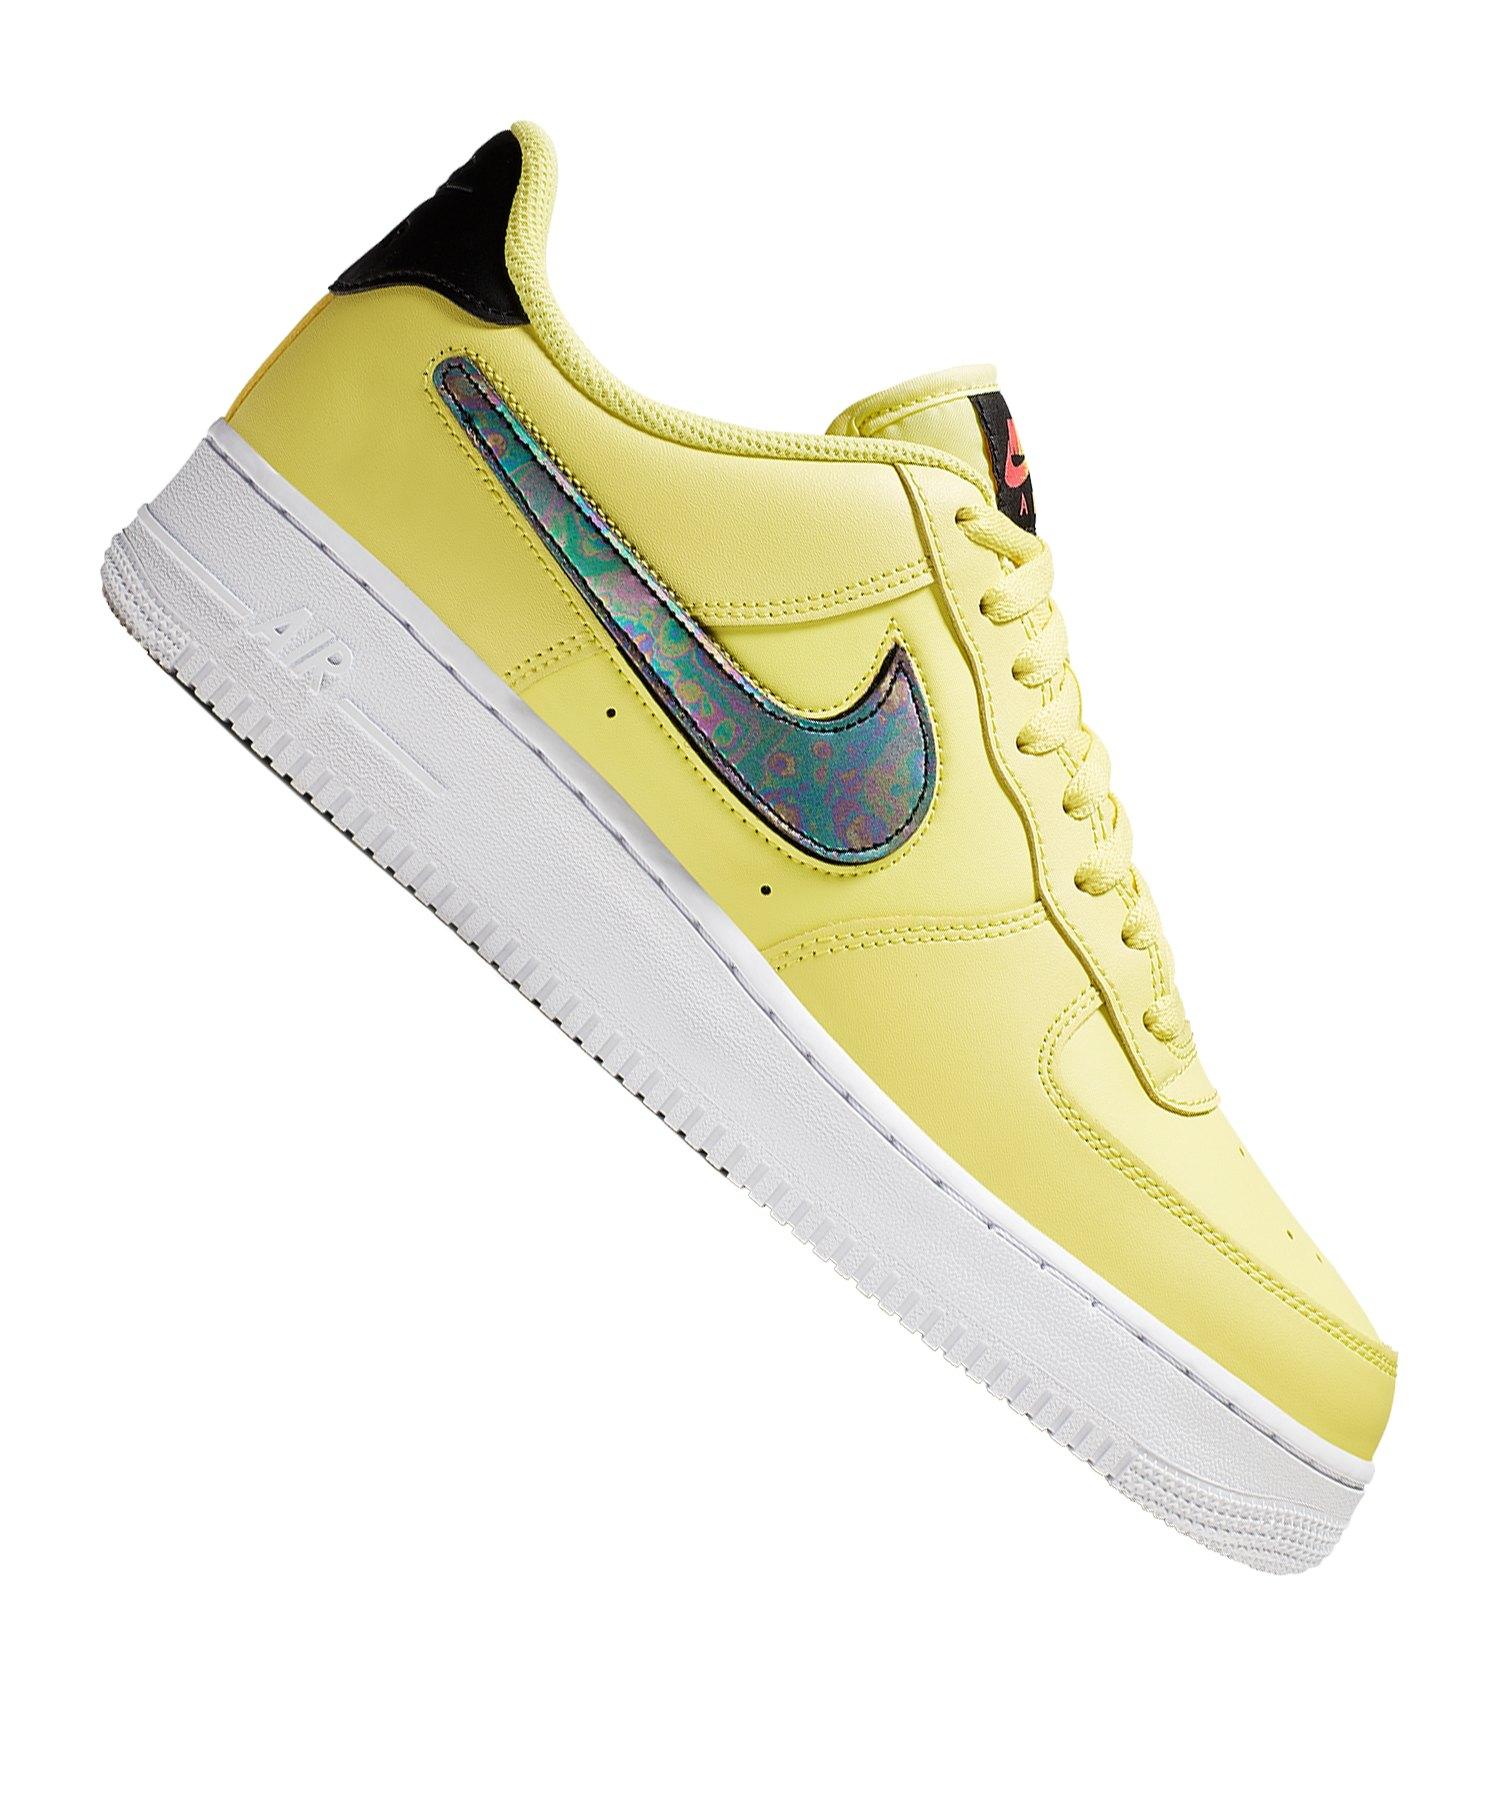 Nike Air Force 1 07 Lv8 Schwarz Gummi Herren Online Bestellen